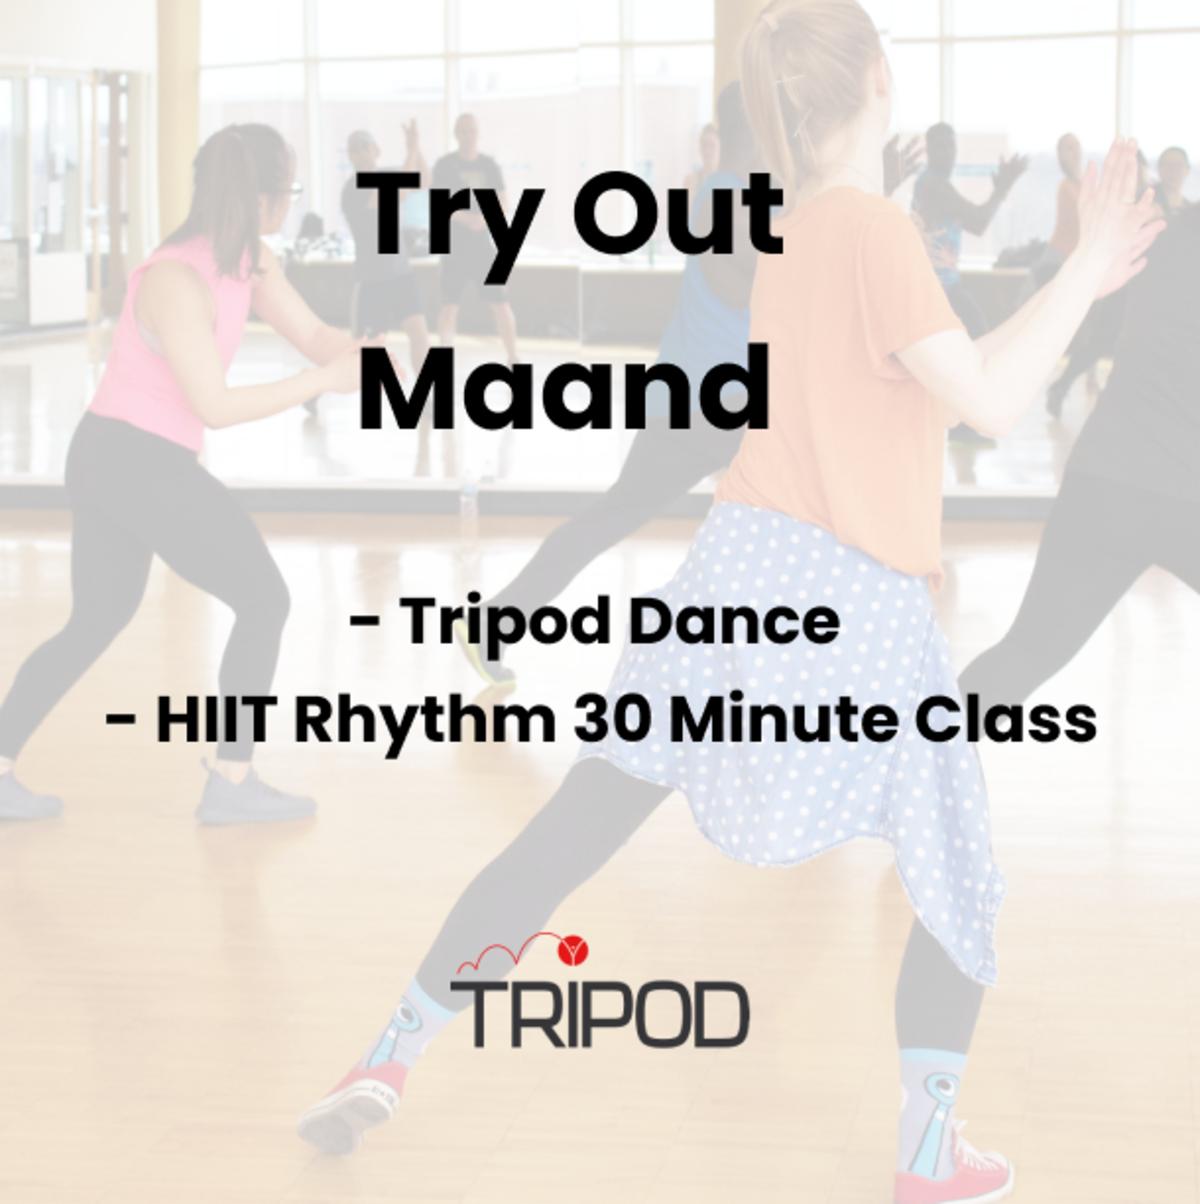 Tripod's Try Out Maand   Tripod Dance & HIIT Rhythm 30 Minute Class